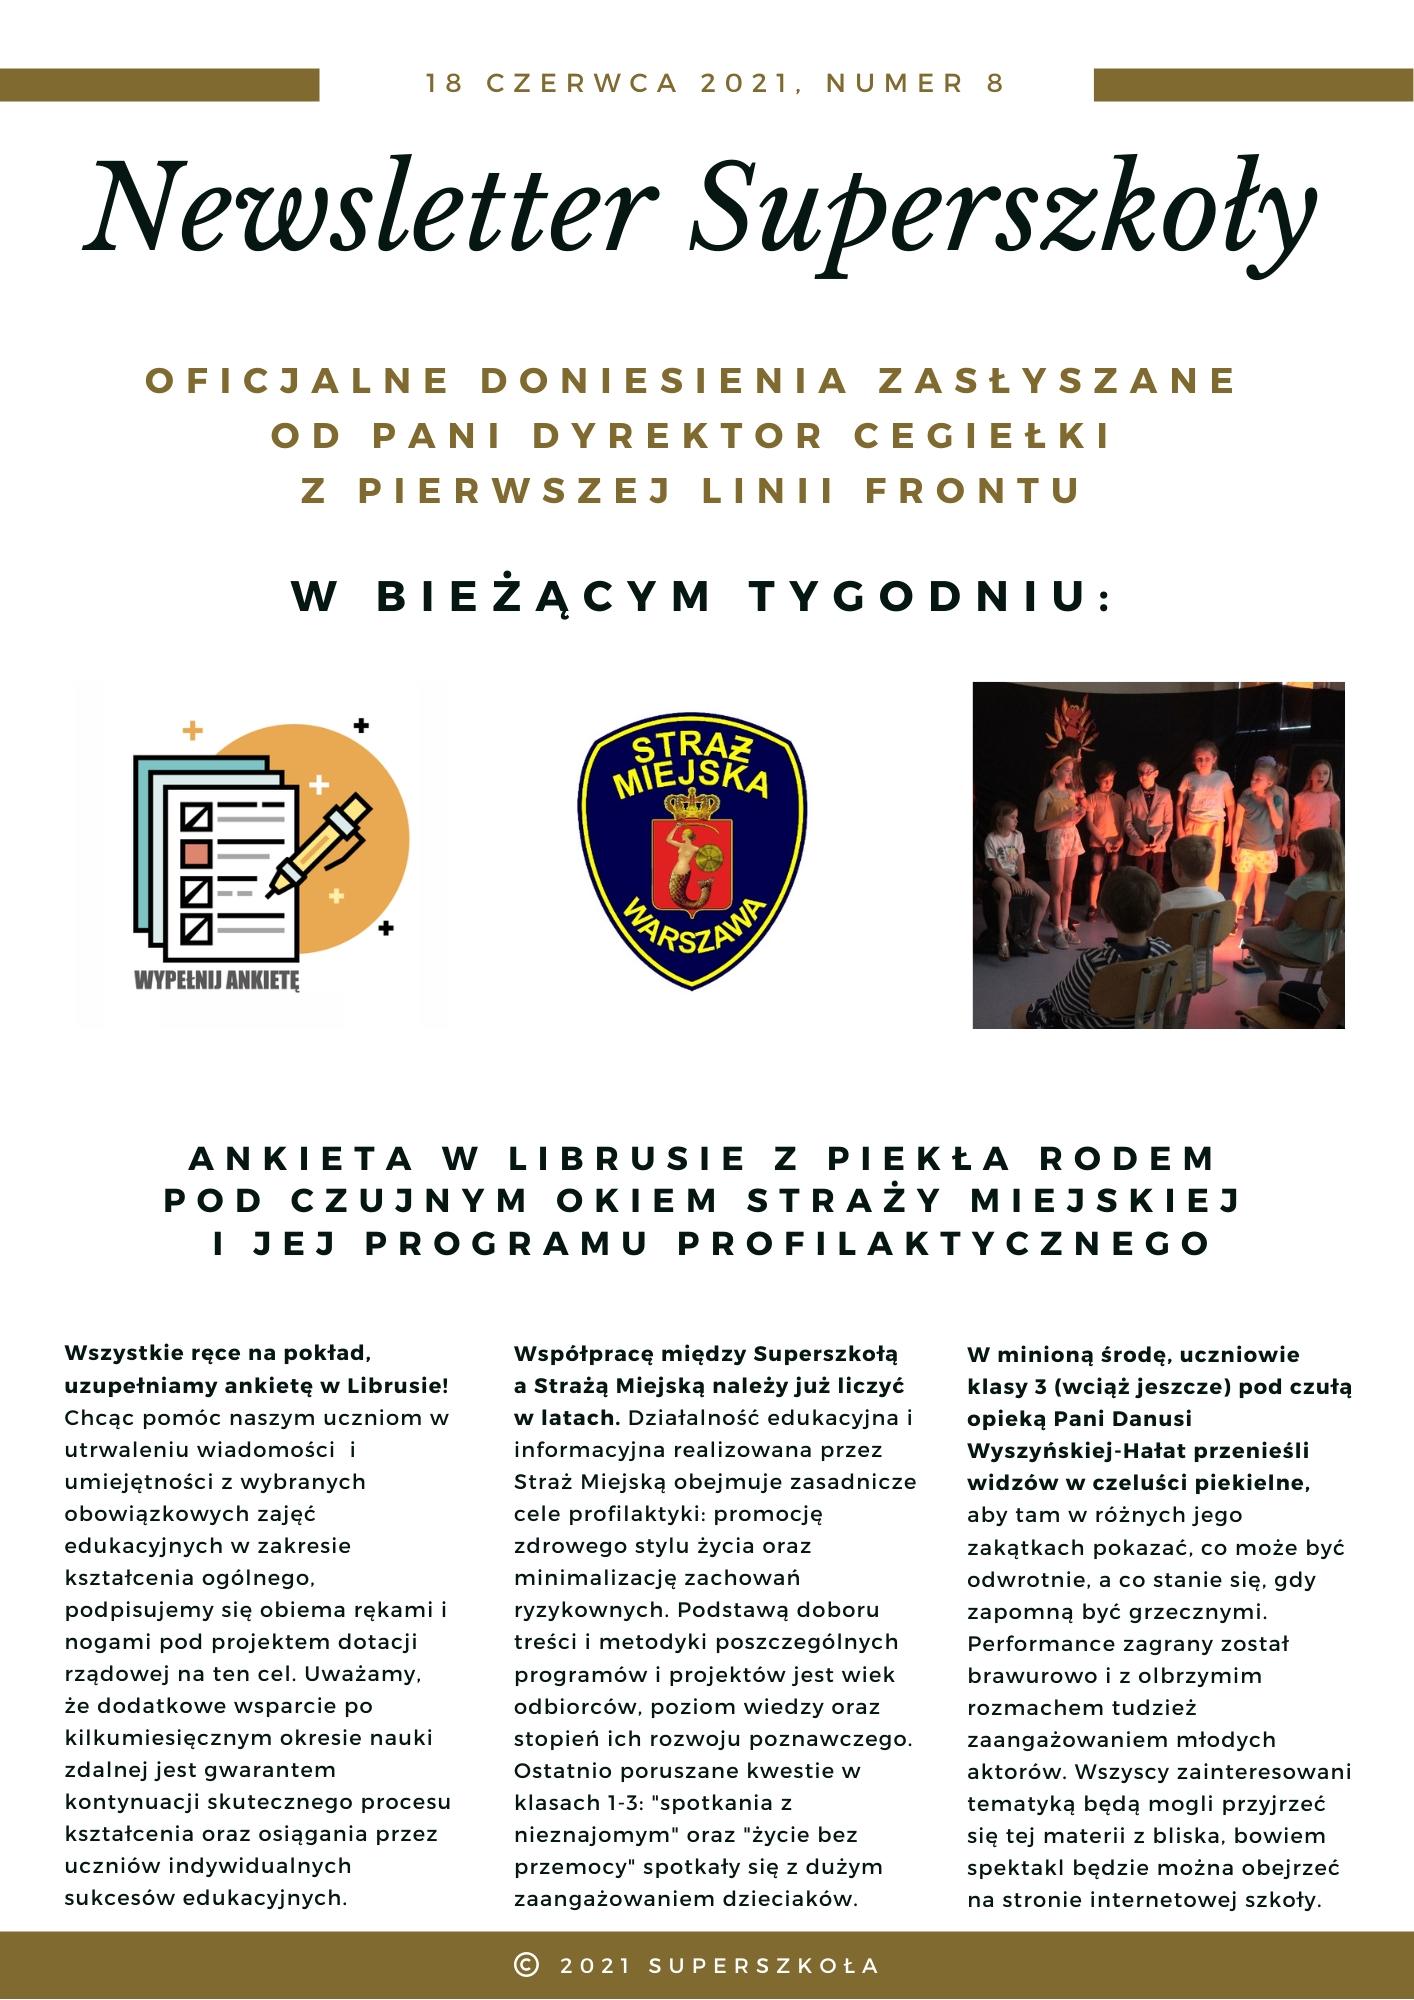 Newsletter_Superszkoły_8